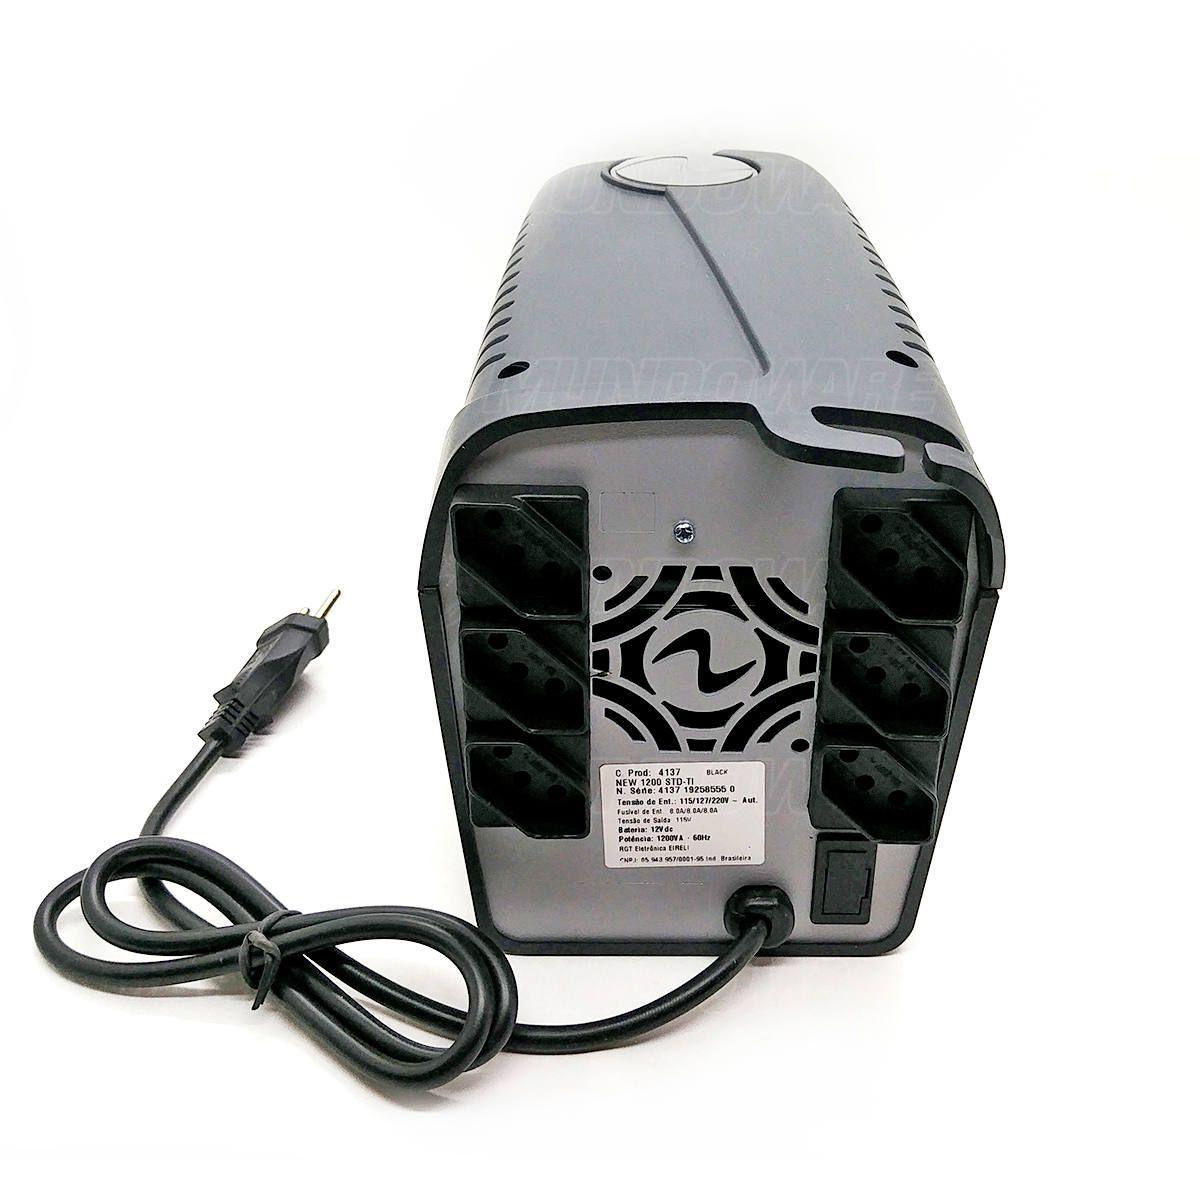 Nobreak 1200VA 600W PWM 6 Tomadas 3 em 1 Troca Fácil de Bateria Trivolt Ragtech Easy Way 1200 STD-TI BL 4137